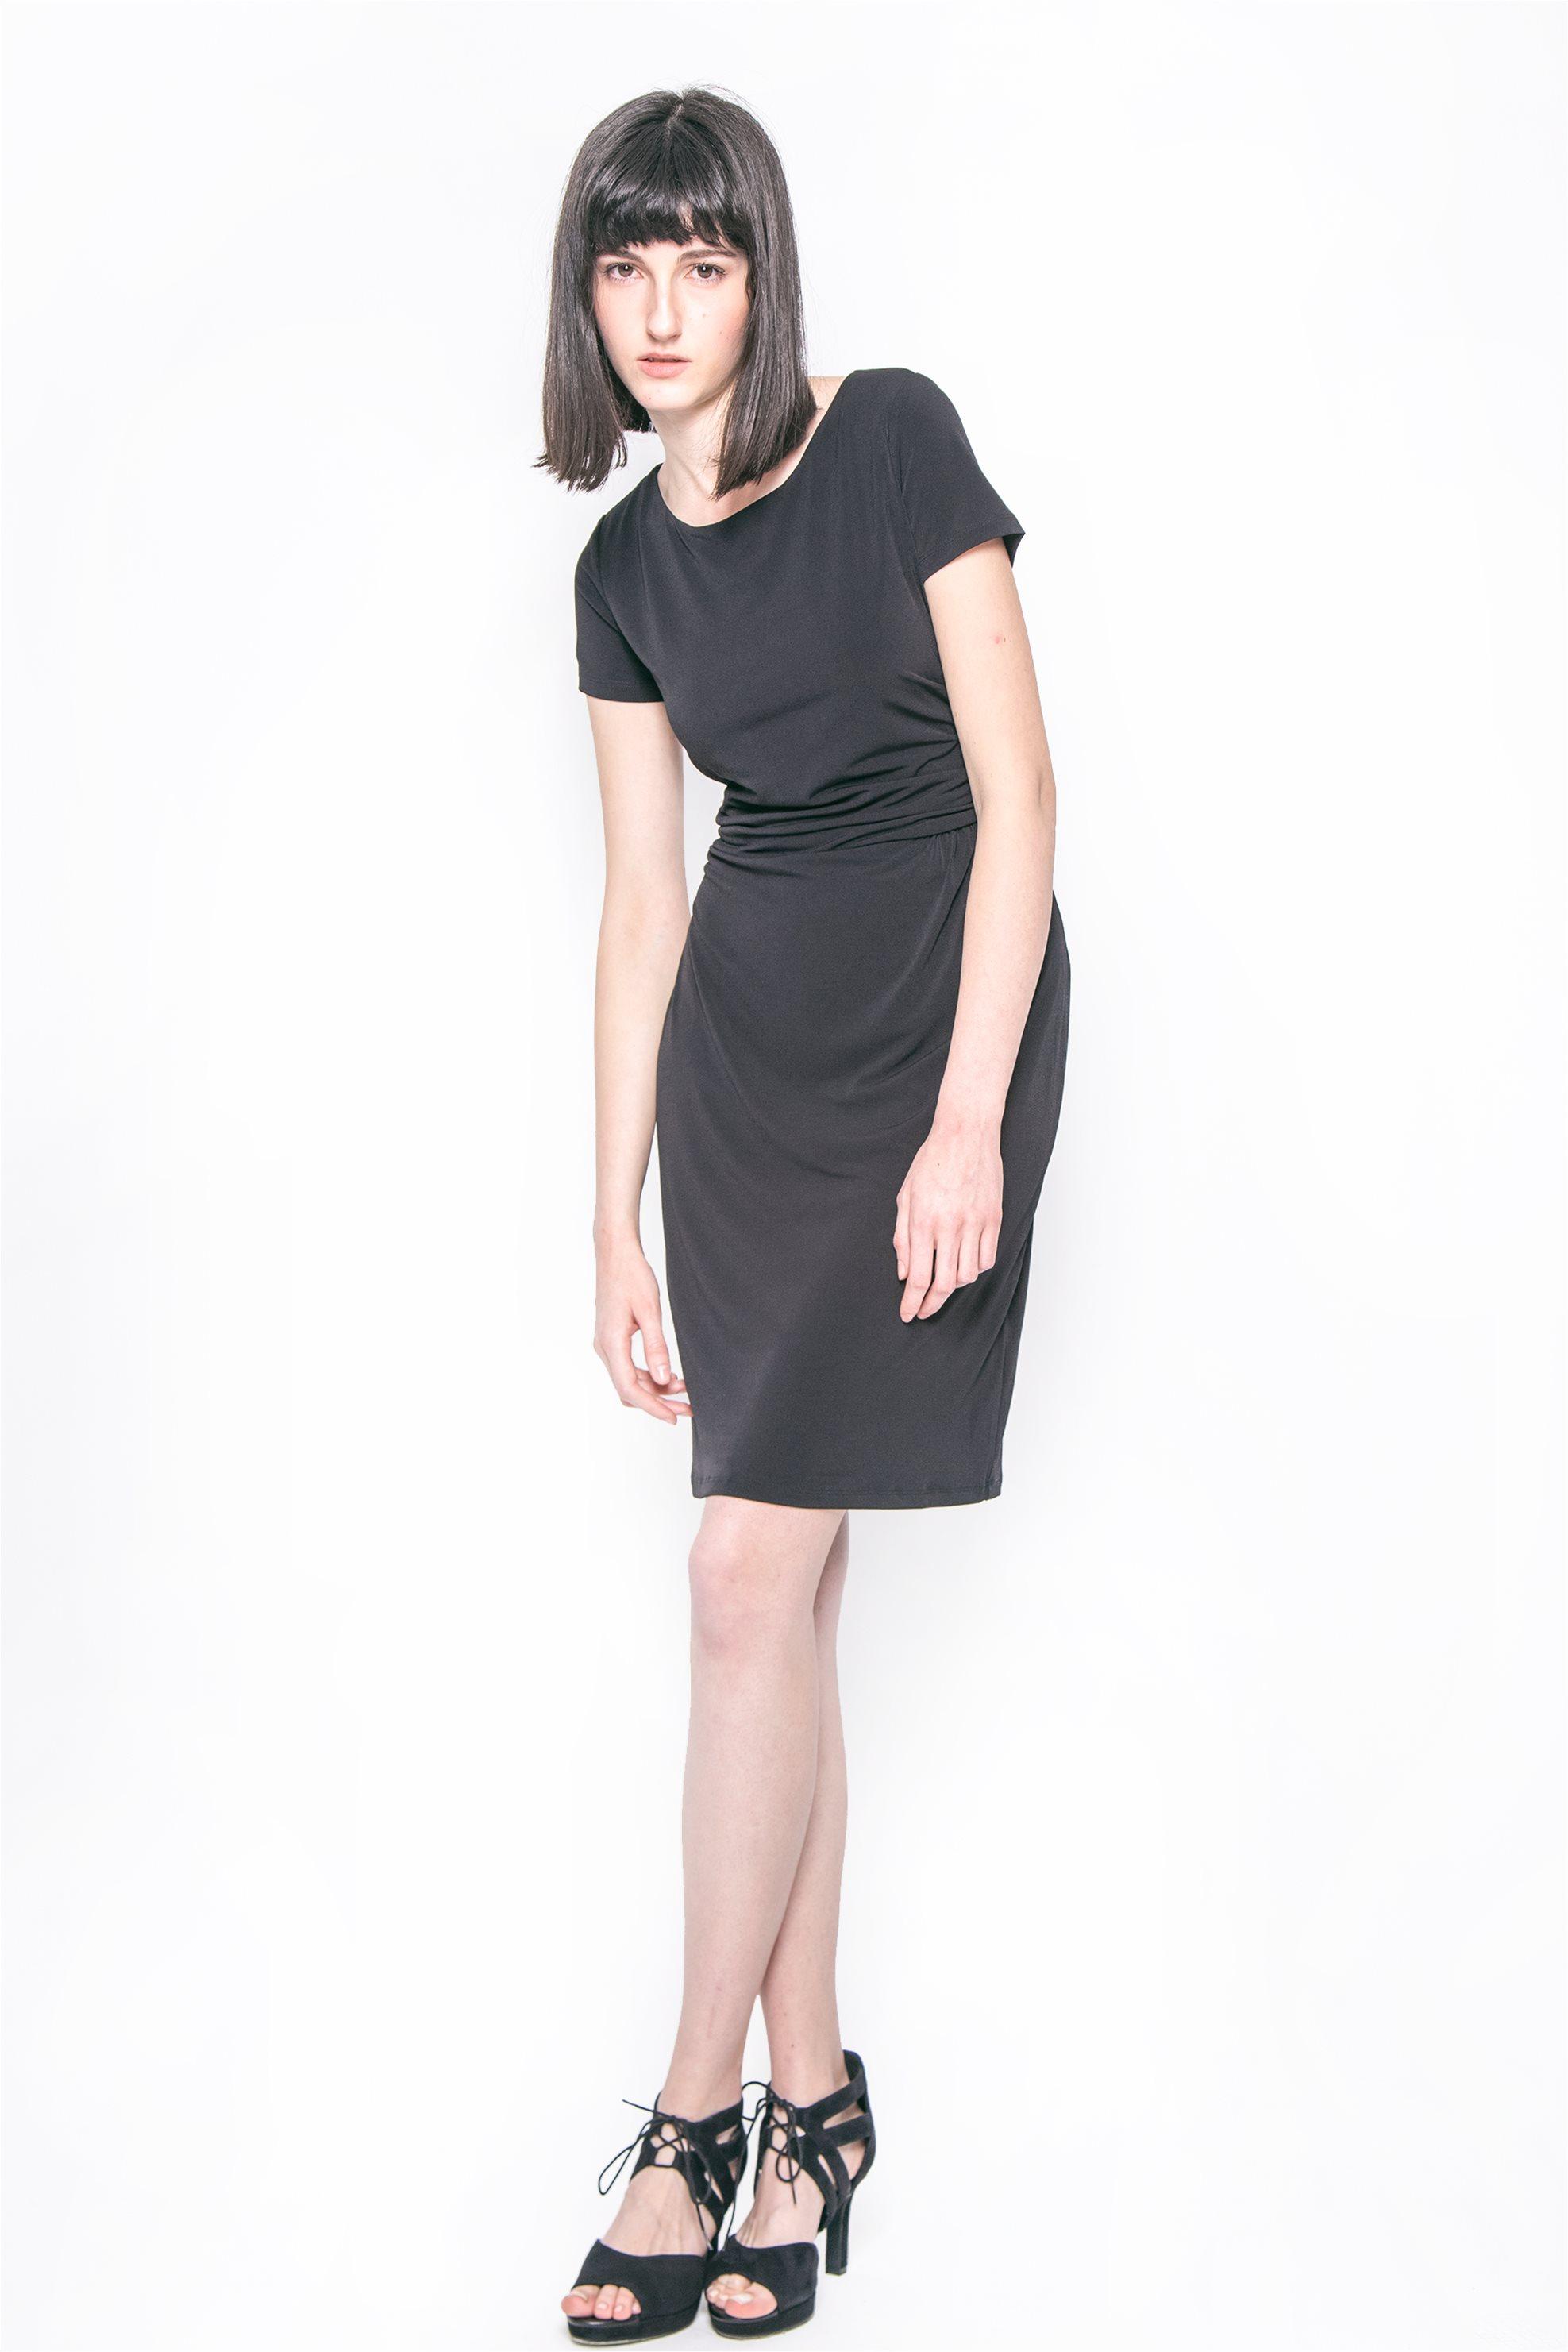 fa7965438614 Γυναικεία   Ρούχα   Φορέματα   Καθημερινά   Φόρεμα καλοκαιρινό κοντό ...